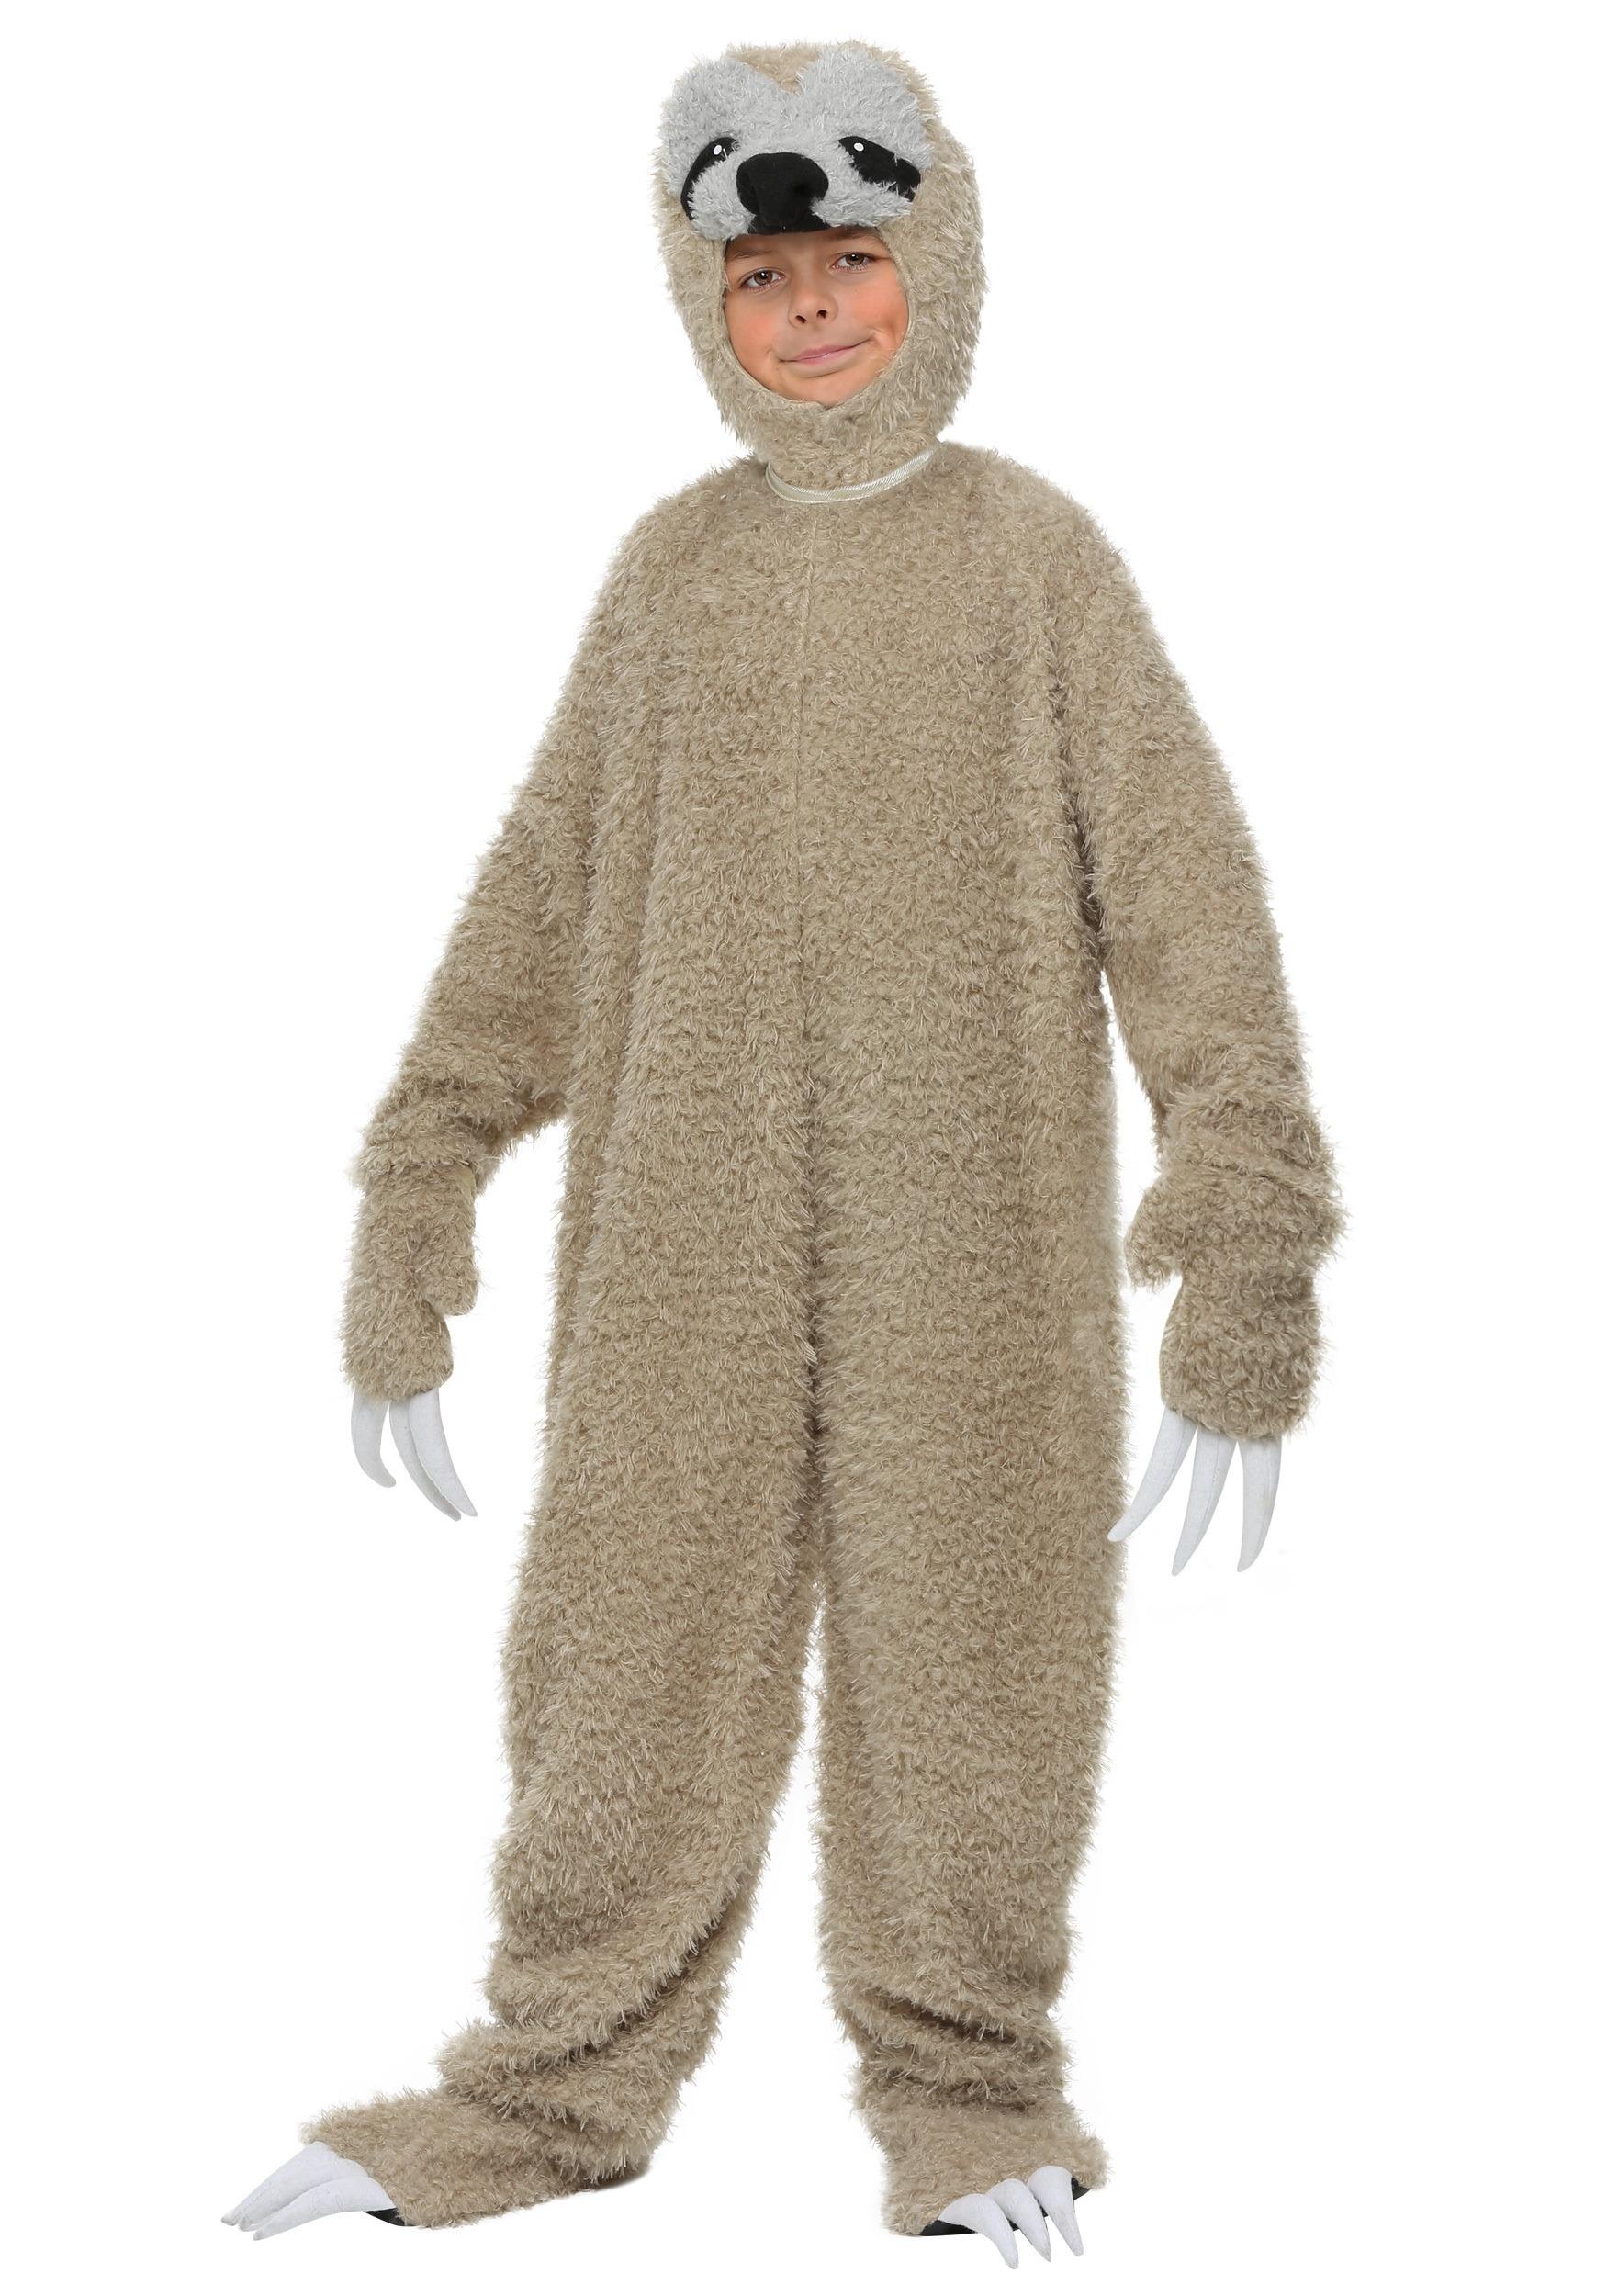 Sloth Costume for Kids 5f23c22548